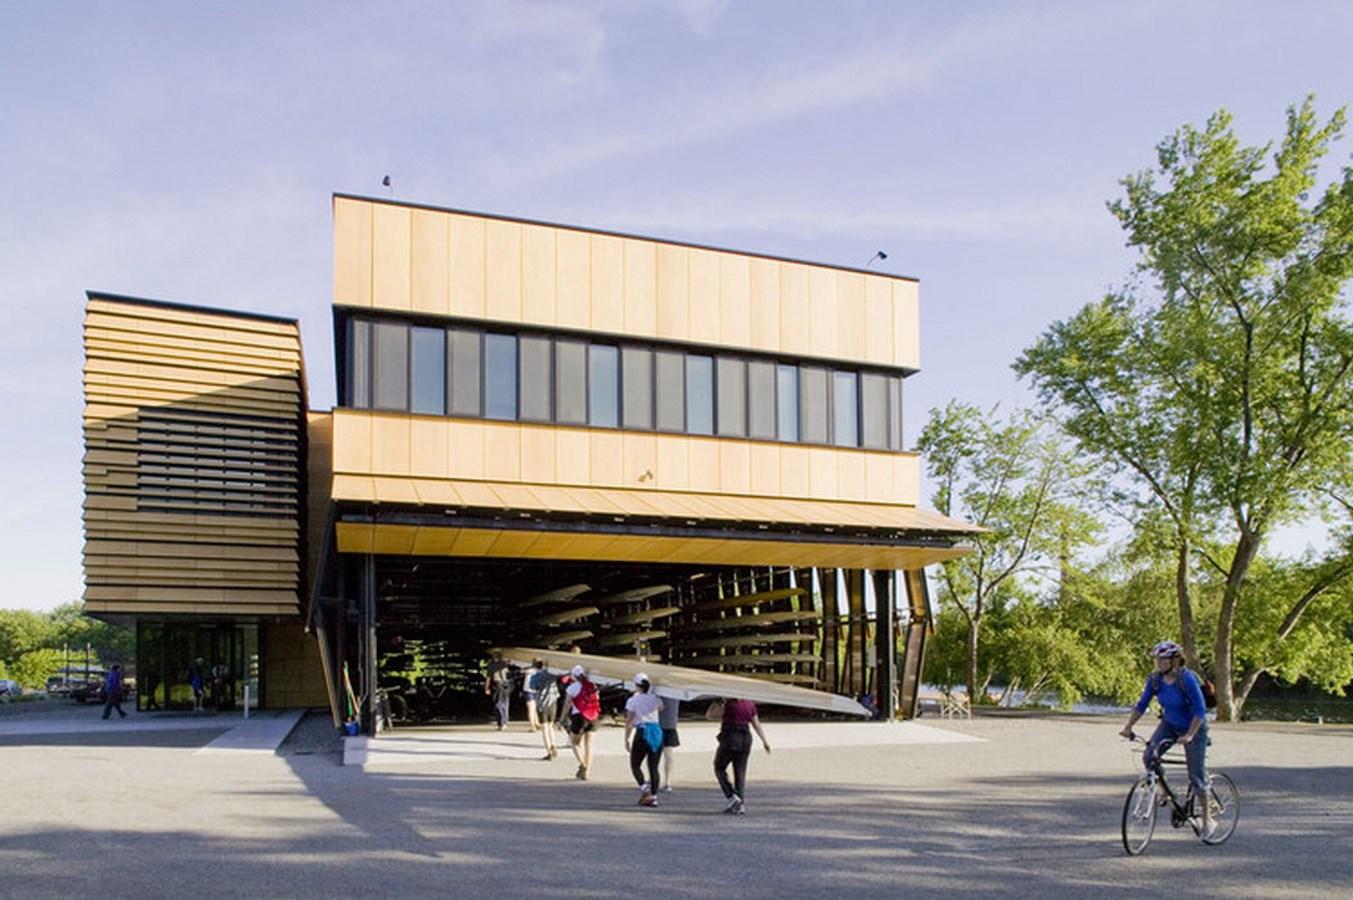 A306 - Boston Architecture - COMMUNITY ROWING BOATHOUSE_Image1